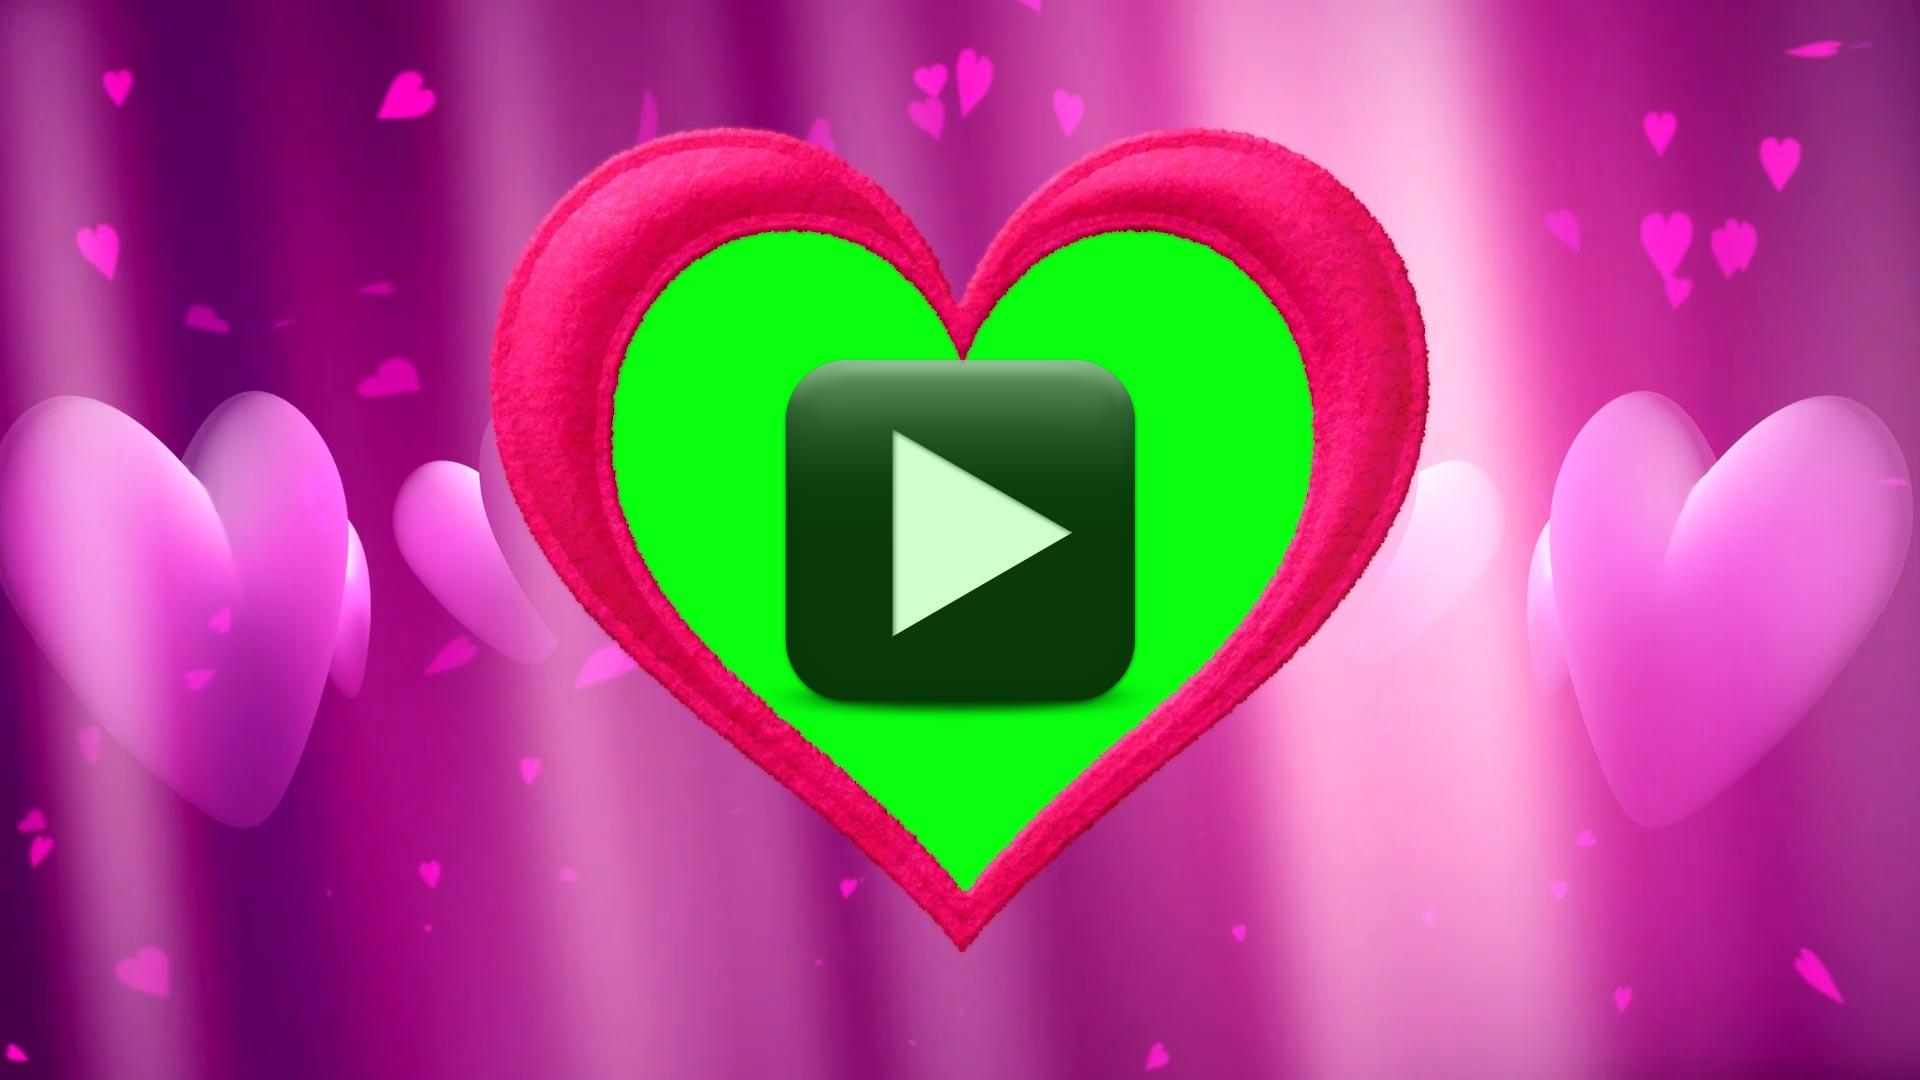 Valentines Day-Wedding Background Video Effects HD 1920x1080p